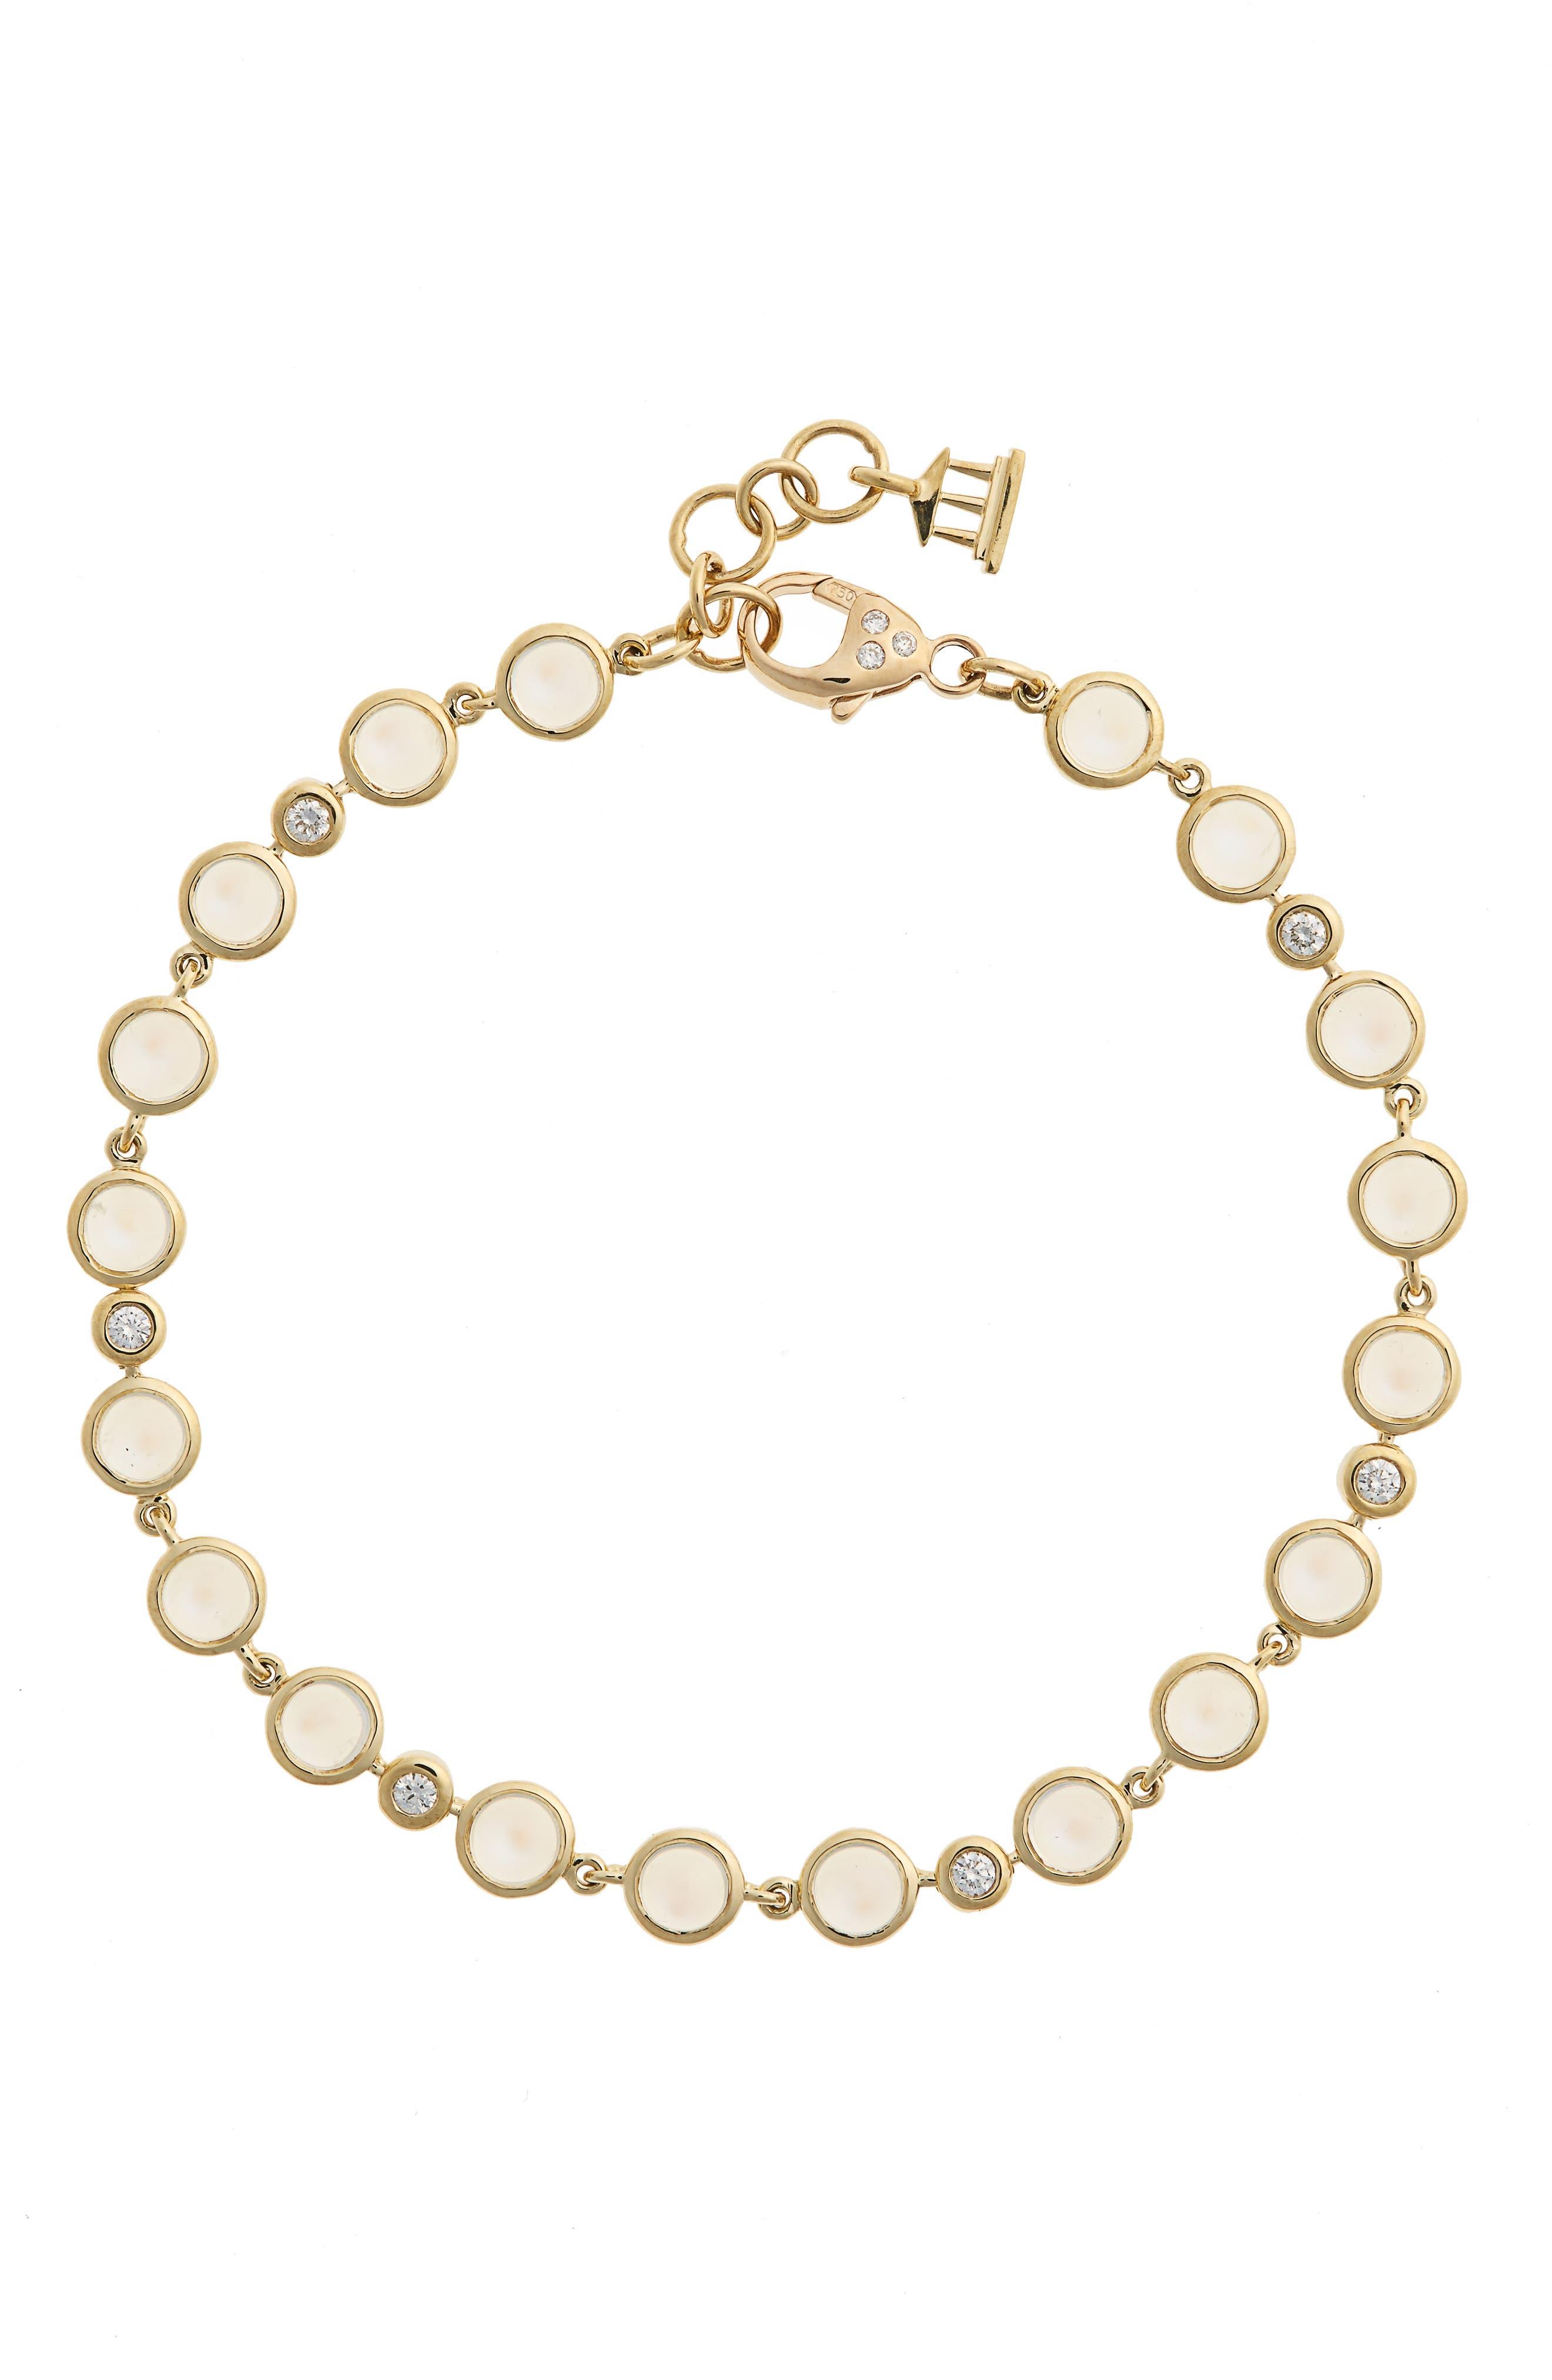 Temple St. Clair Diamond & Moonstone Bracelet,                             Main thumbnail 1, color,                             YELLOW GOLD/ BLUE MOONSTONE